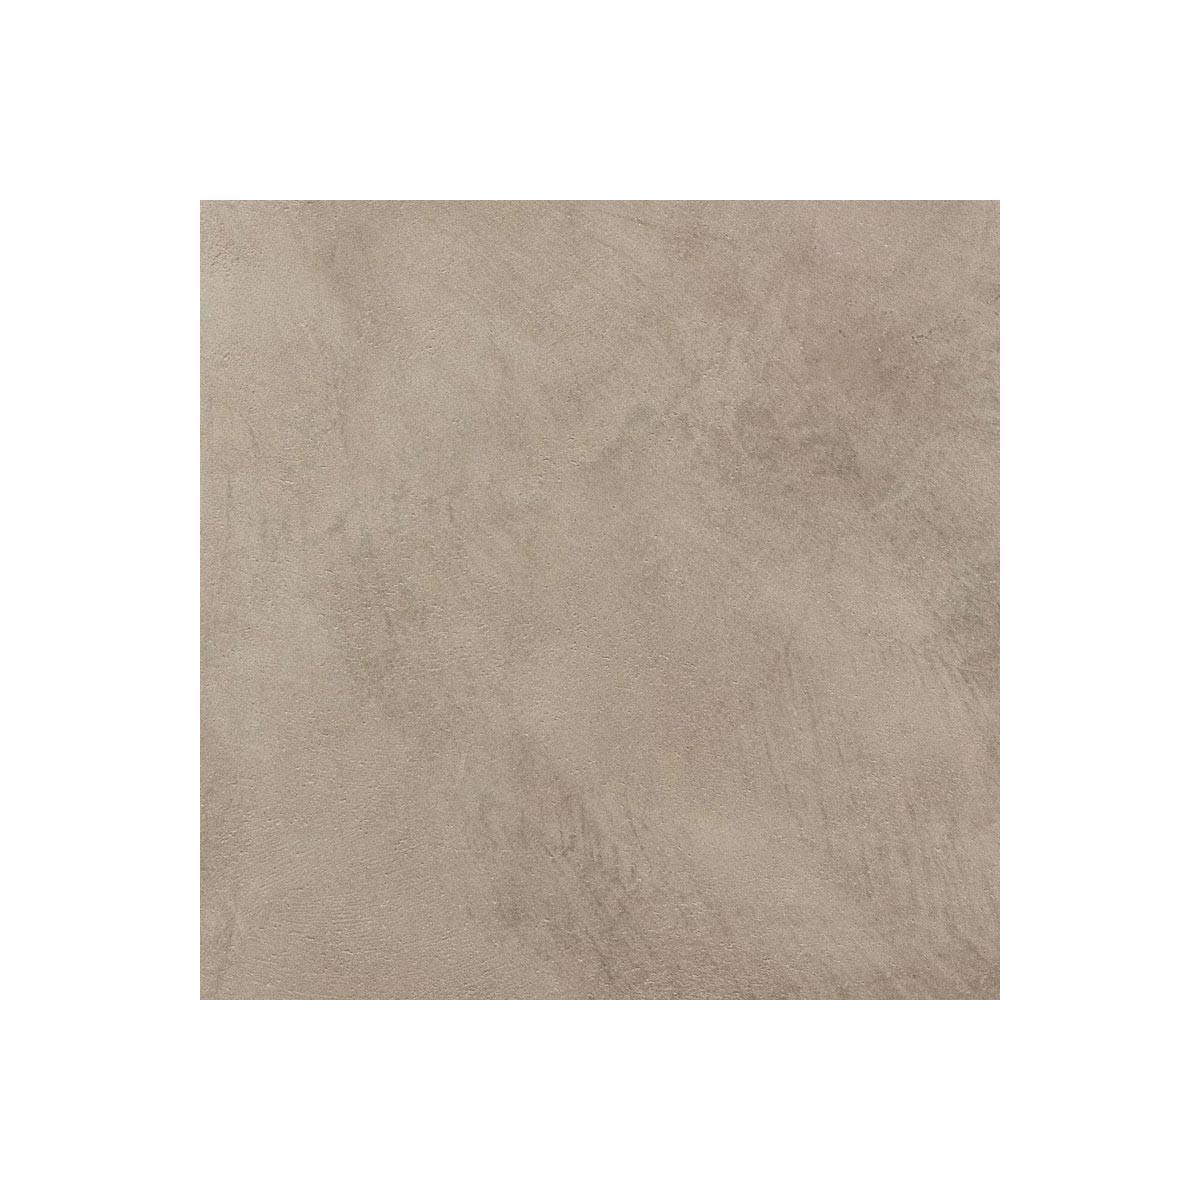 b ton cir plan de travail cuisine cr dence vier sol mur. Black Bedroom Furniture Sets. Home Design Ideas